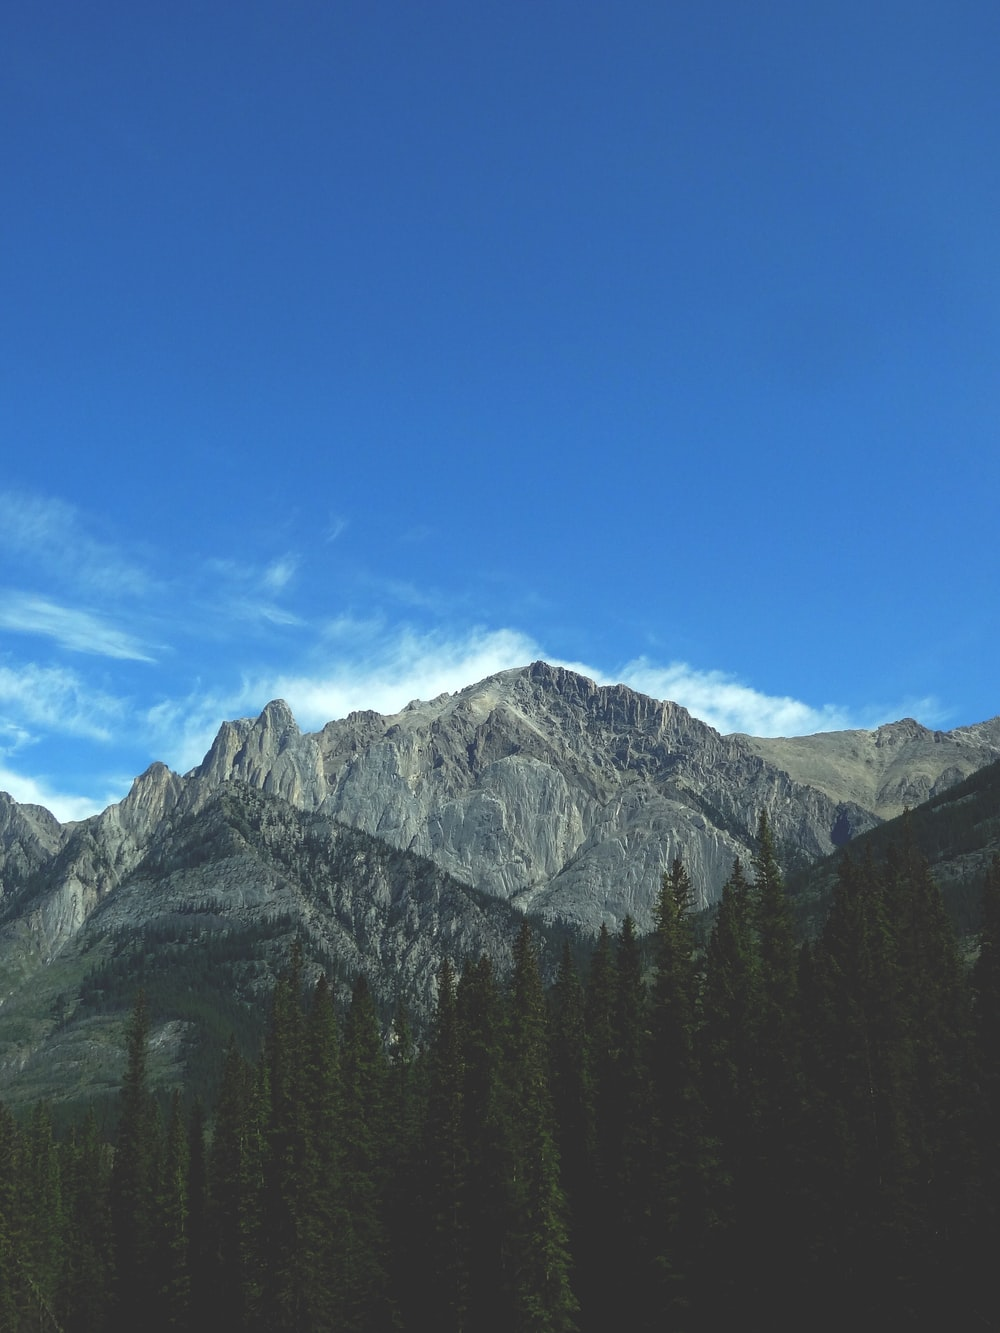 gray mountain scenery during daytime